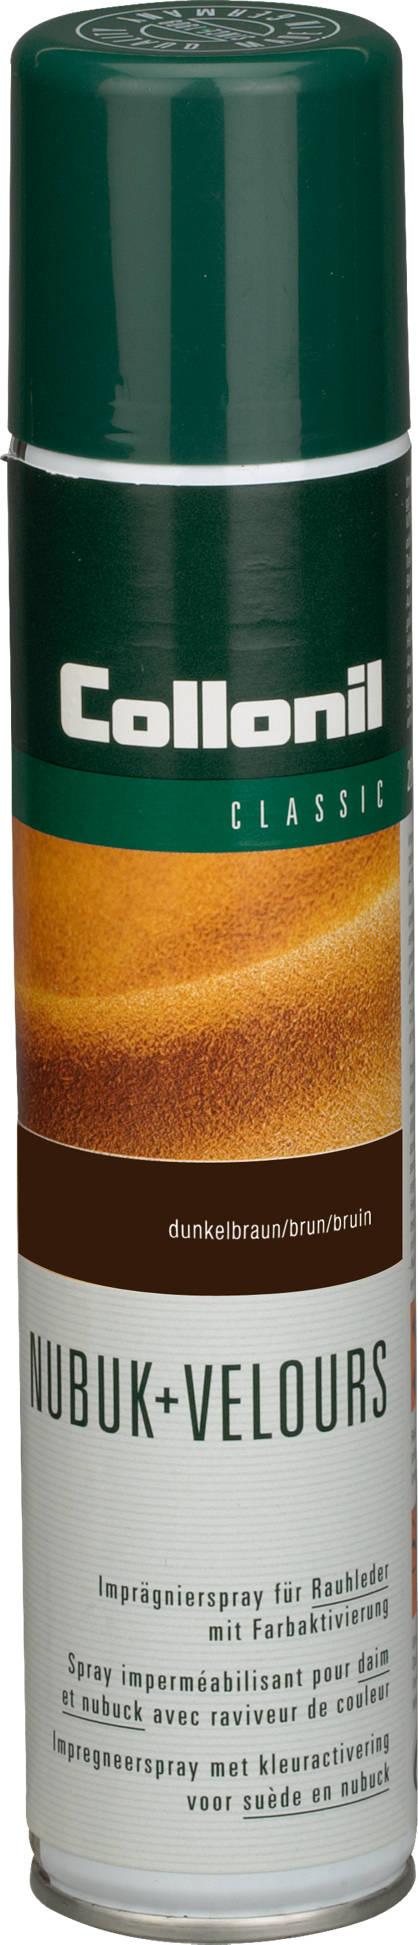 Collonil 200 ml Nubuk & Velours Spray dunkelbraun (4,75 EUR - 100 ml)